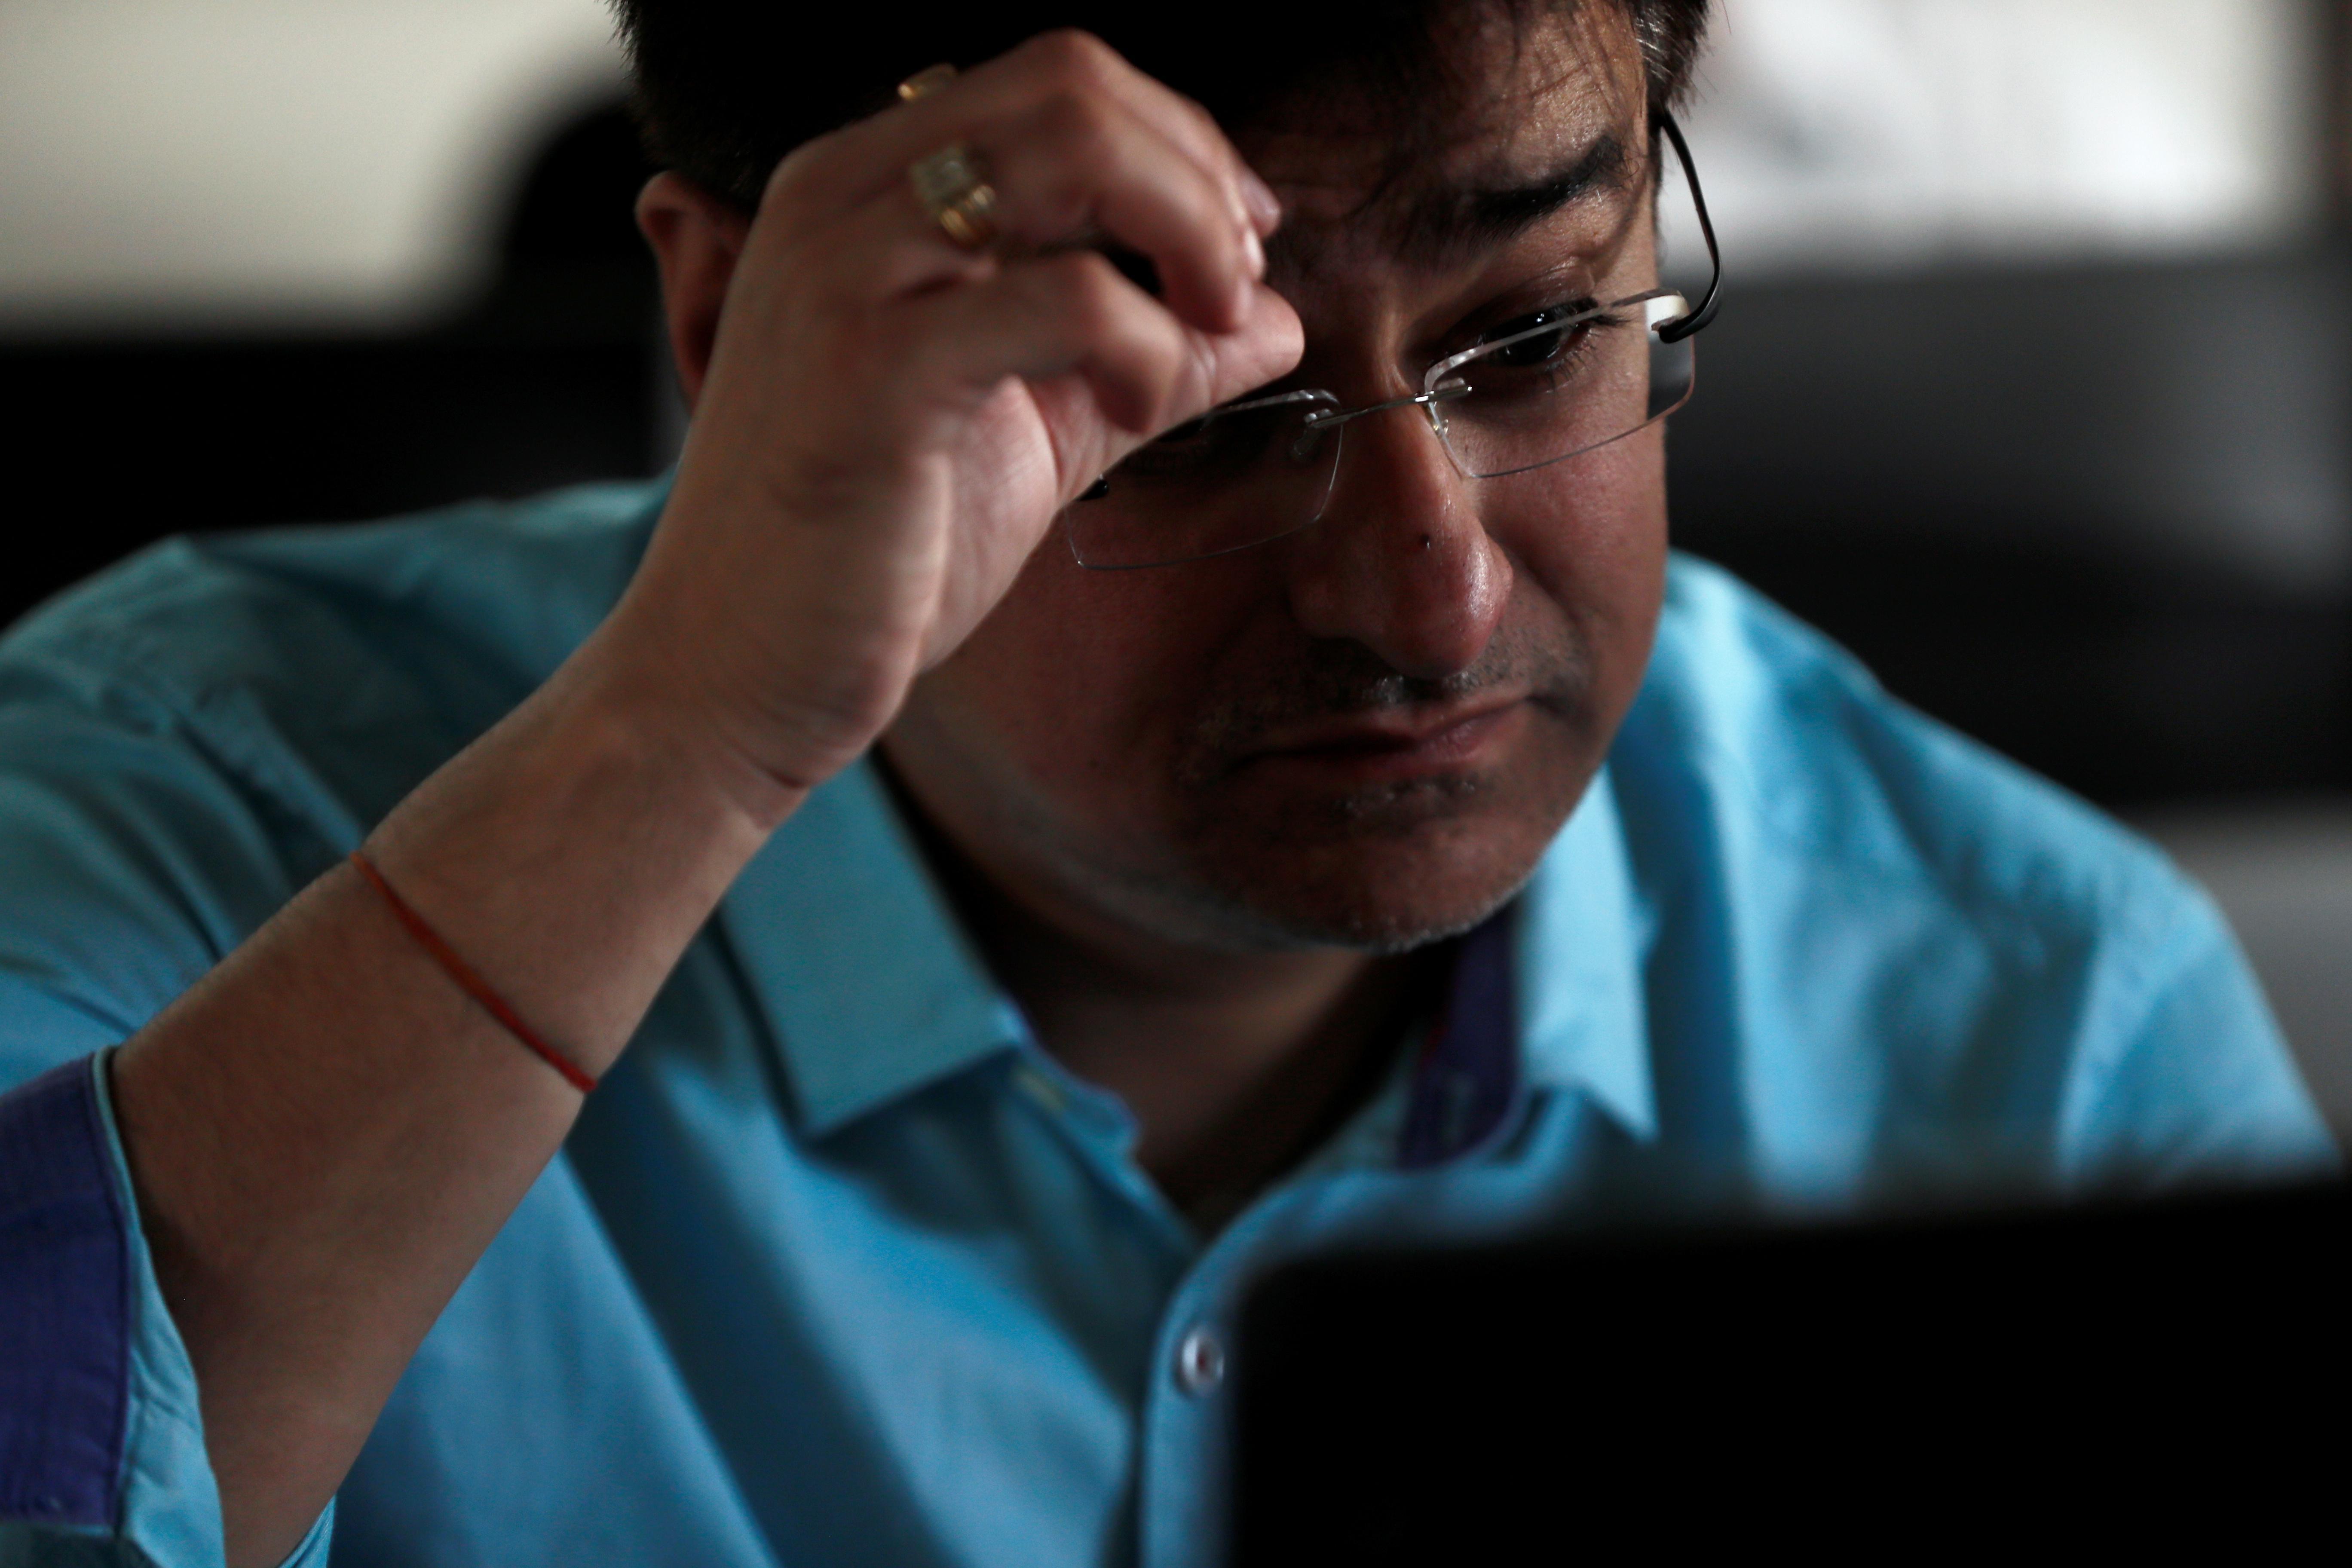 Sensex , Nifty rebound on stimulus hopes as coronavirus spreads